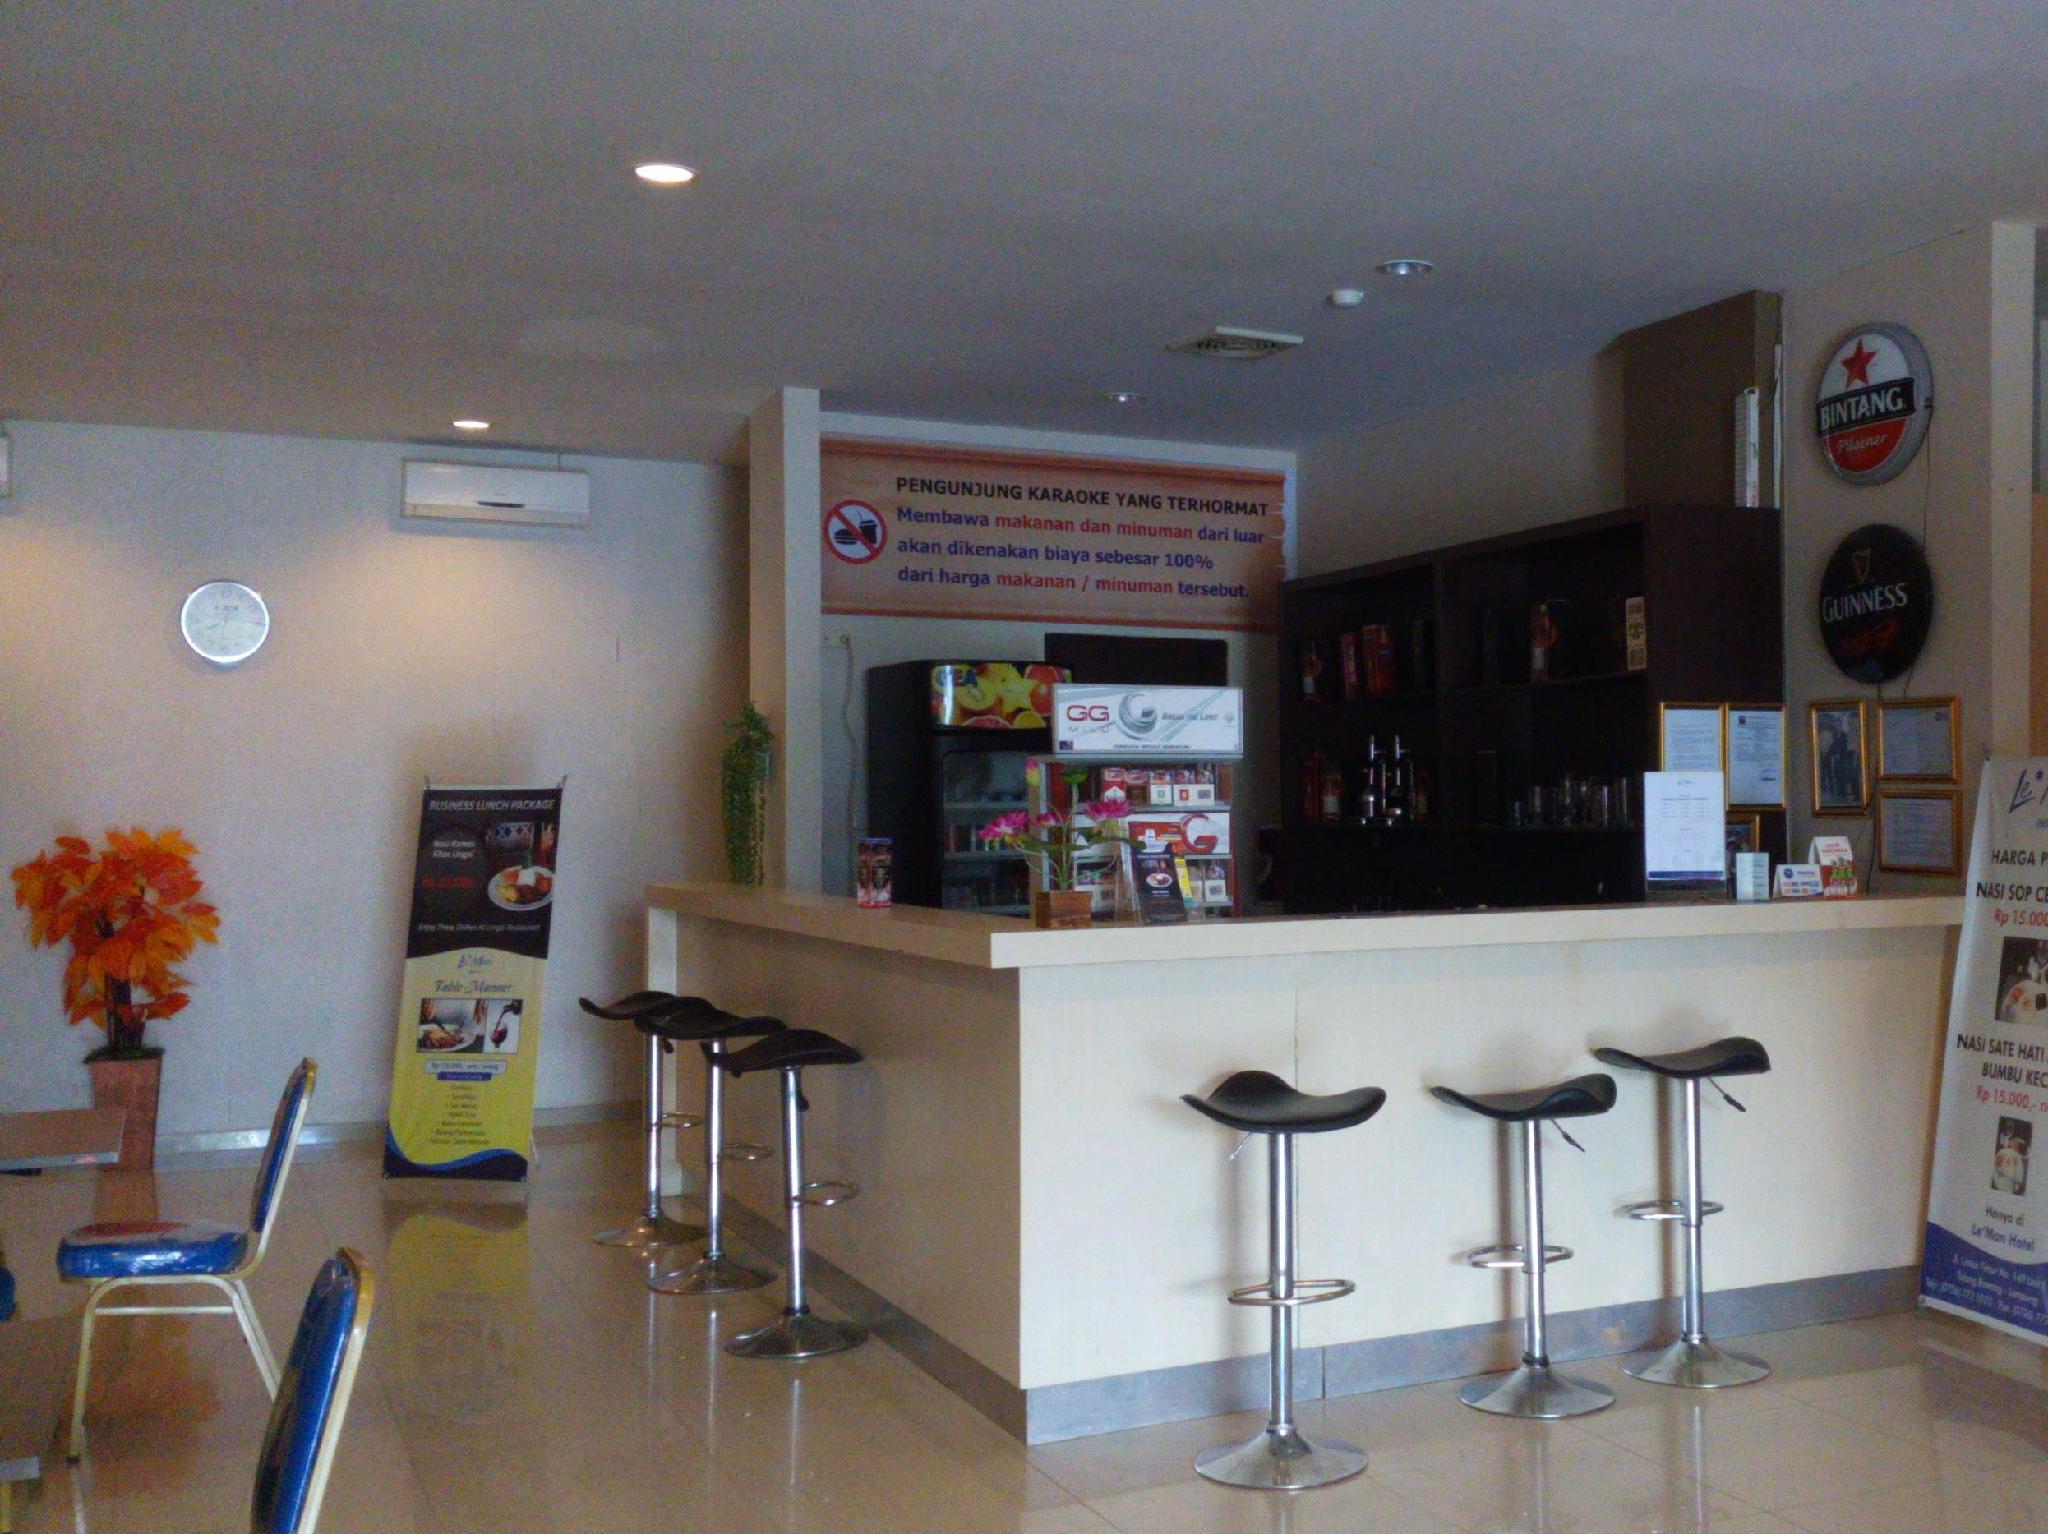 Le Man Hotel Lampung Book / Directions - NAVITIME Transit